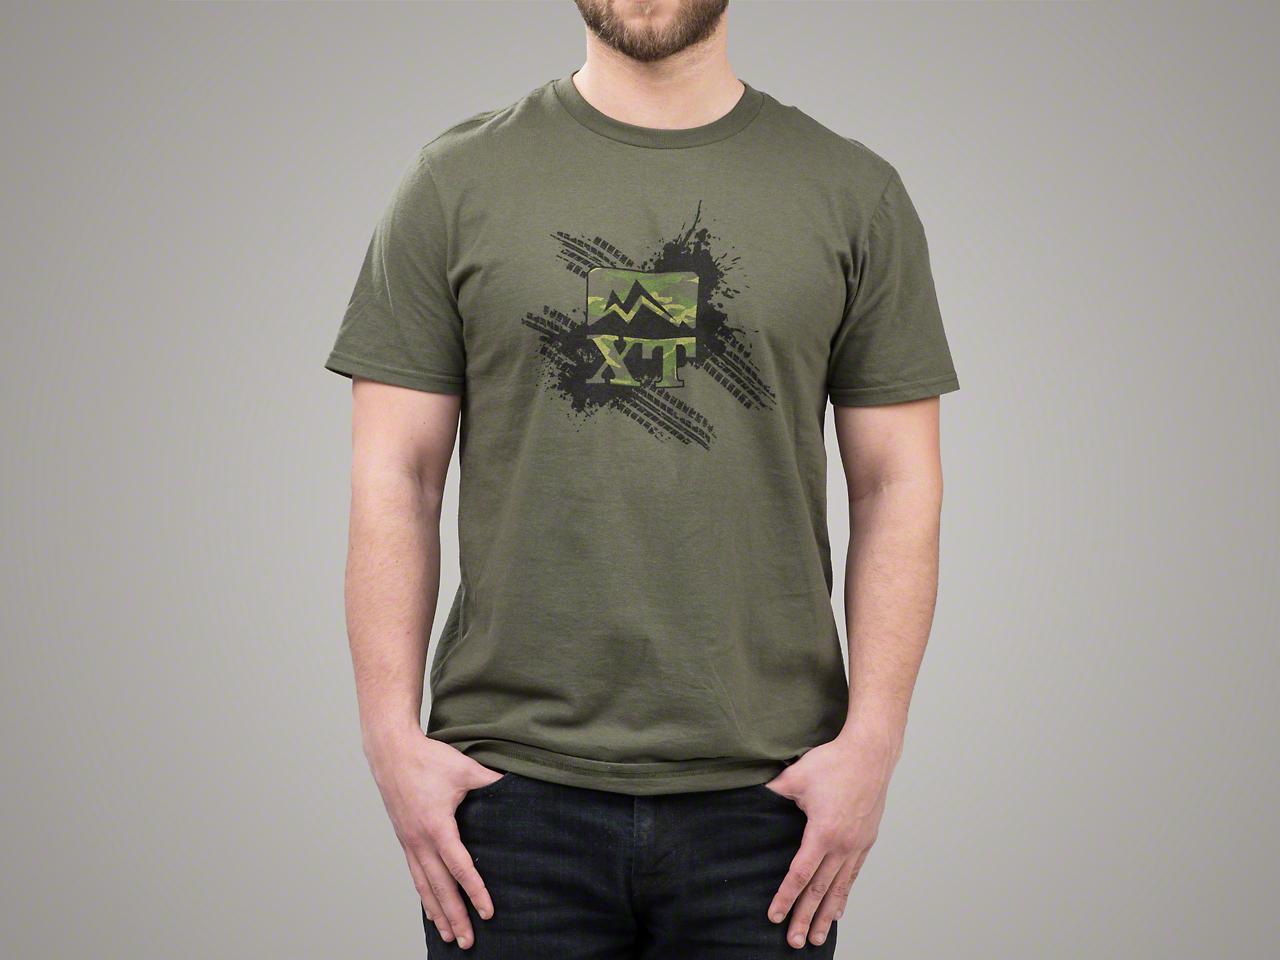 XT Hunter Camo Tread T-Shirt